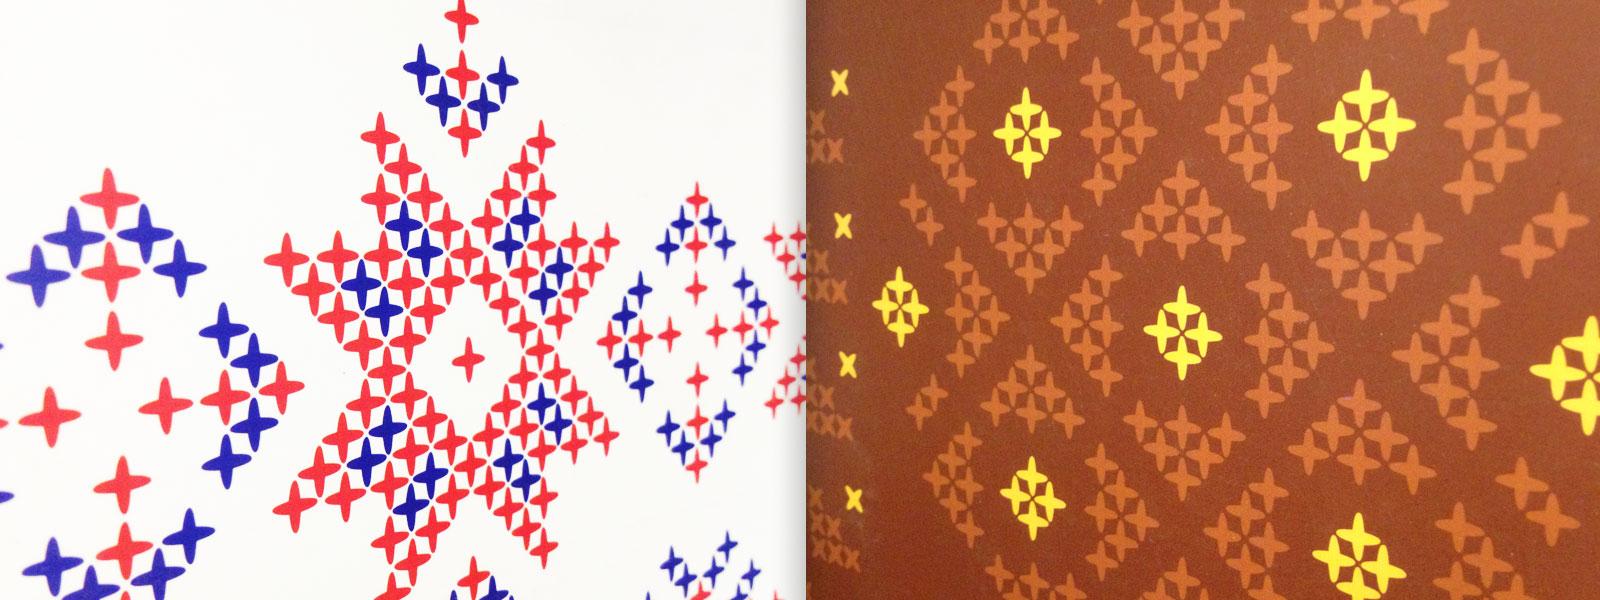 Palestinian Embroidery Patterns Palestine International Institute Patterns Design